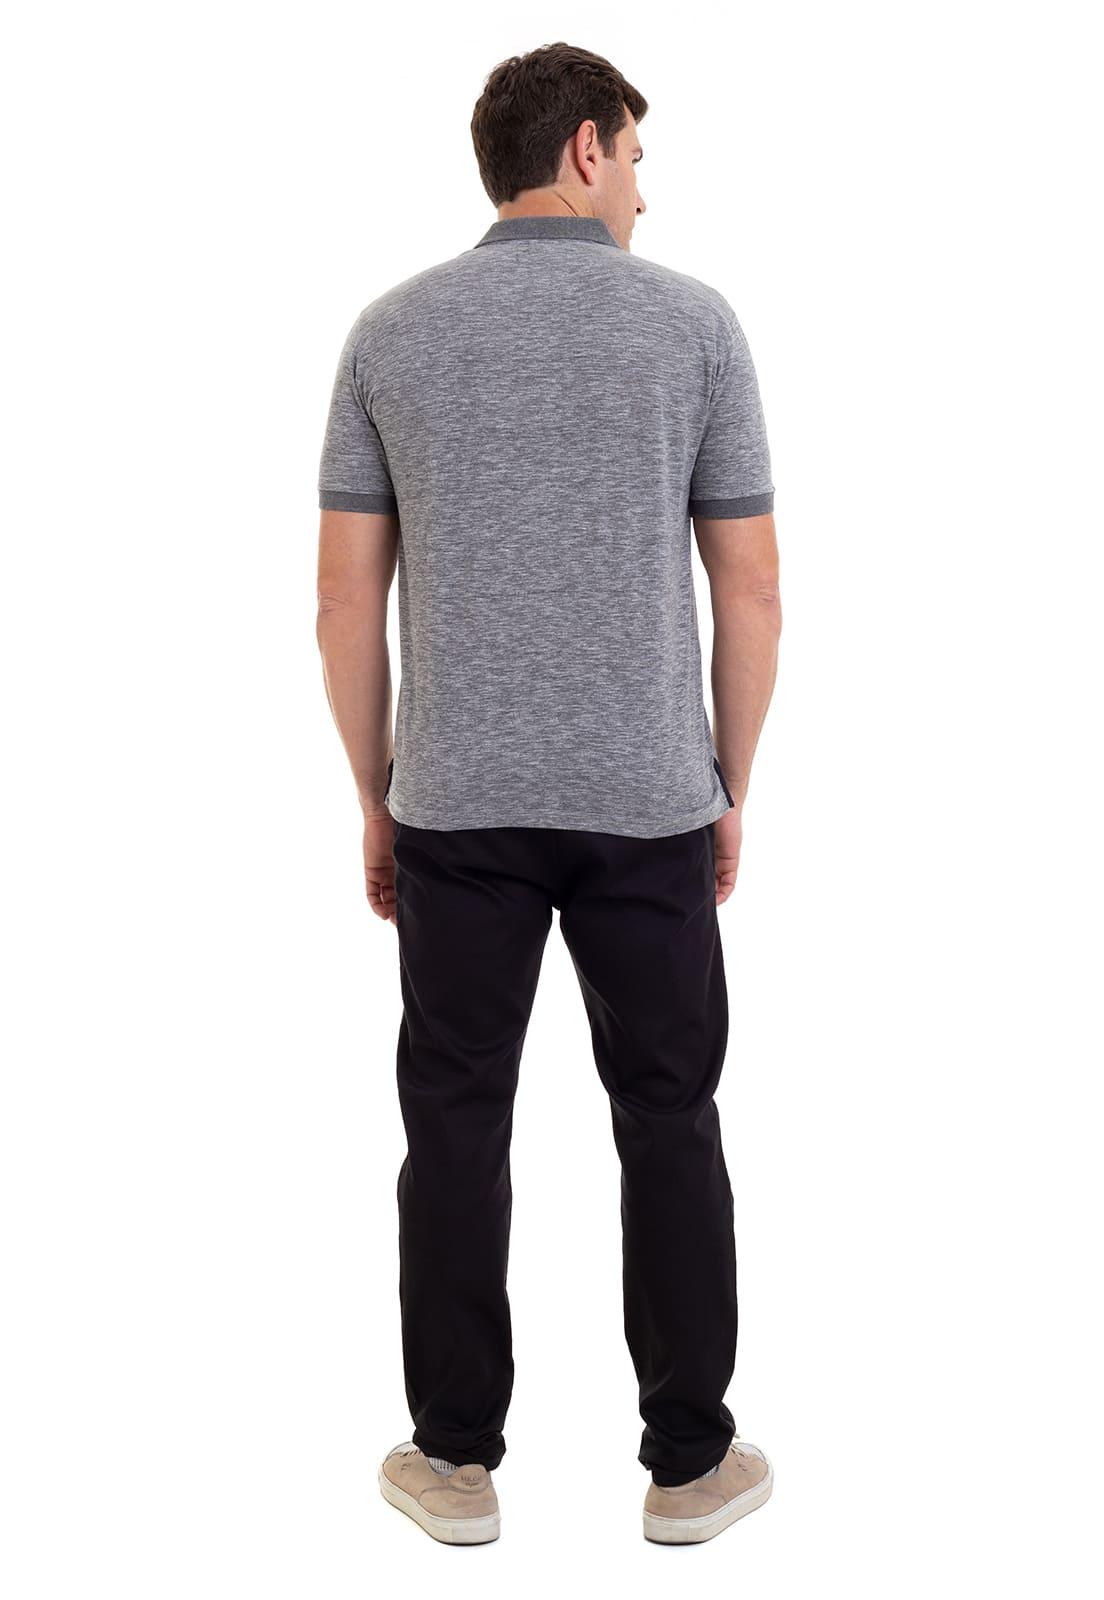 Camisa Polo Masculina Hifen Básica Cinza